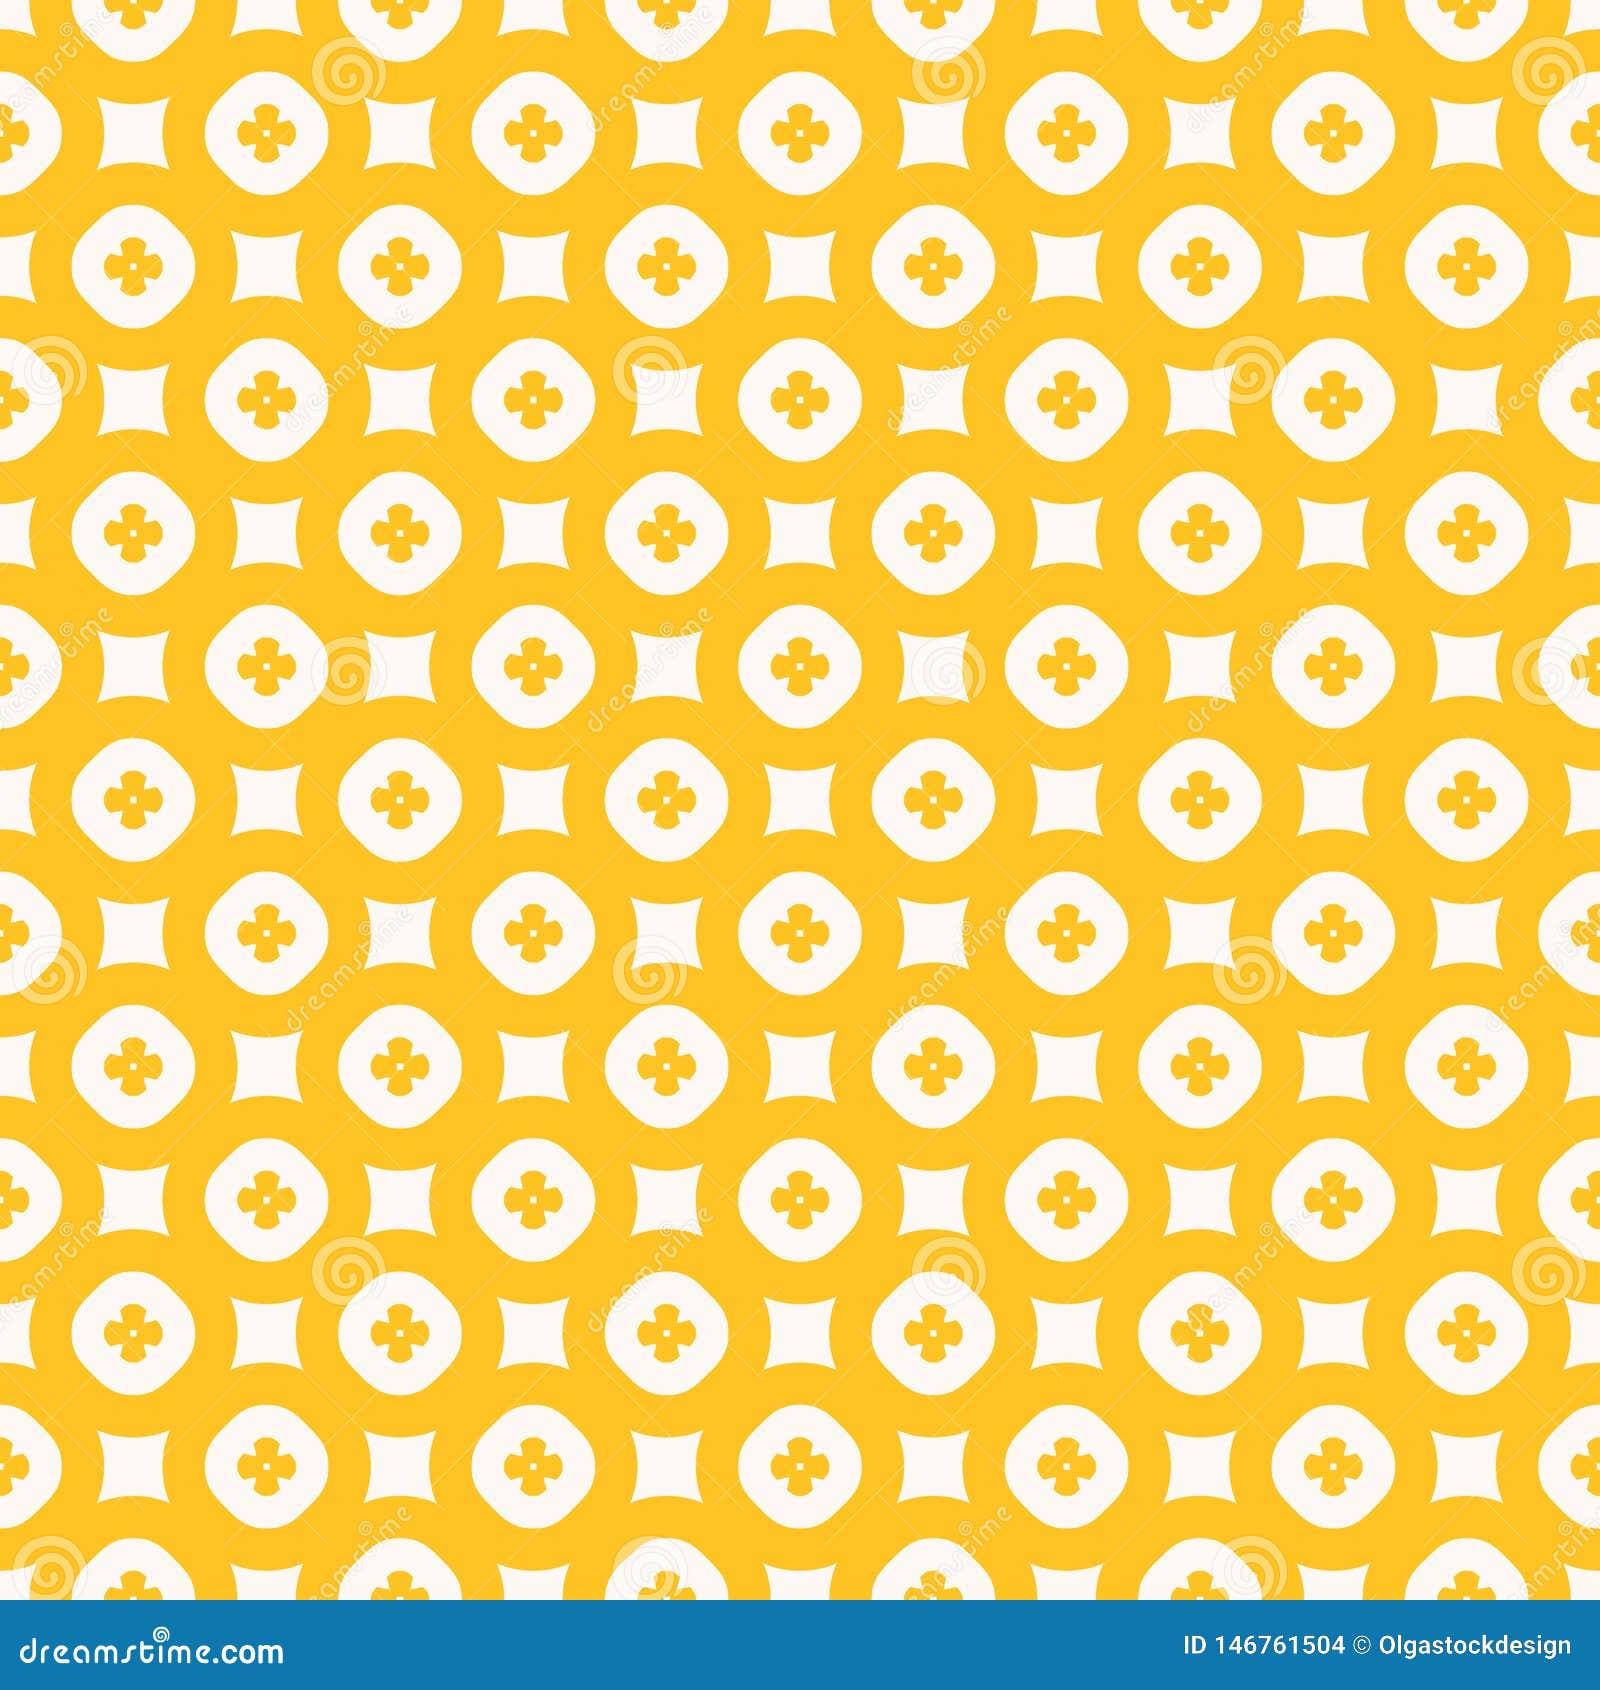 Modelo incons?til del vector floral amarillo Textura geom?trica abstracta simple